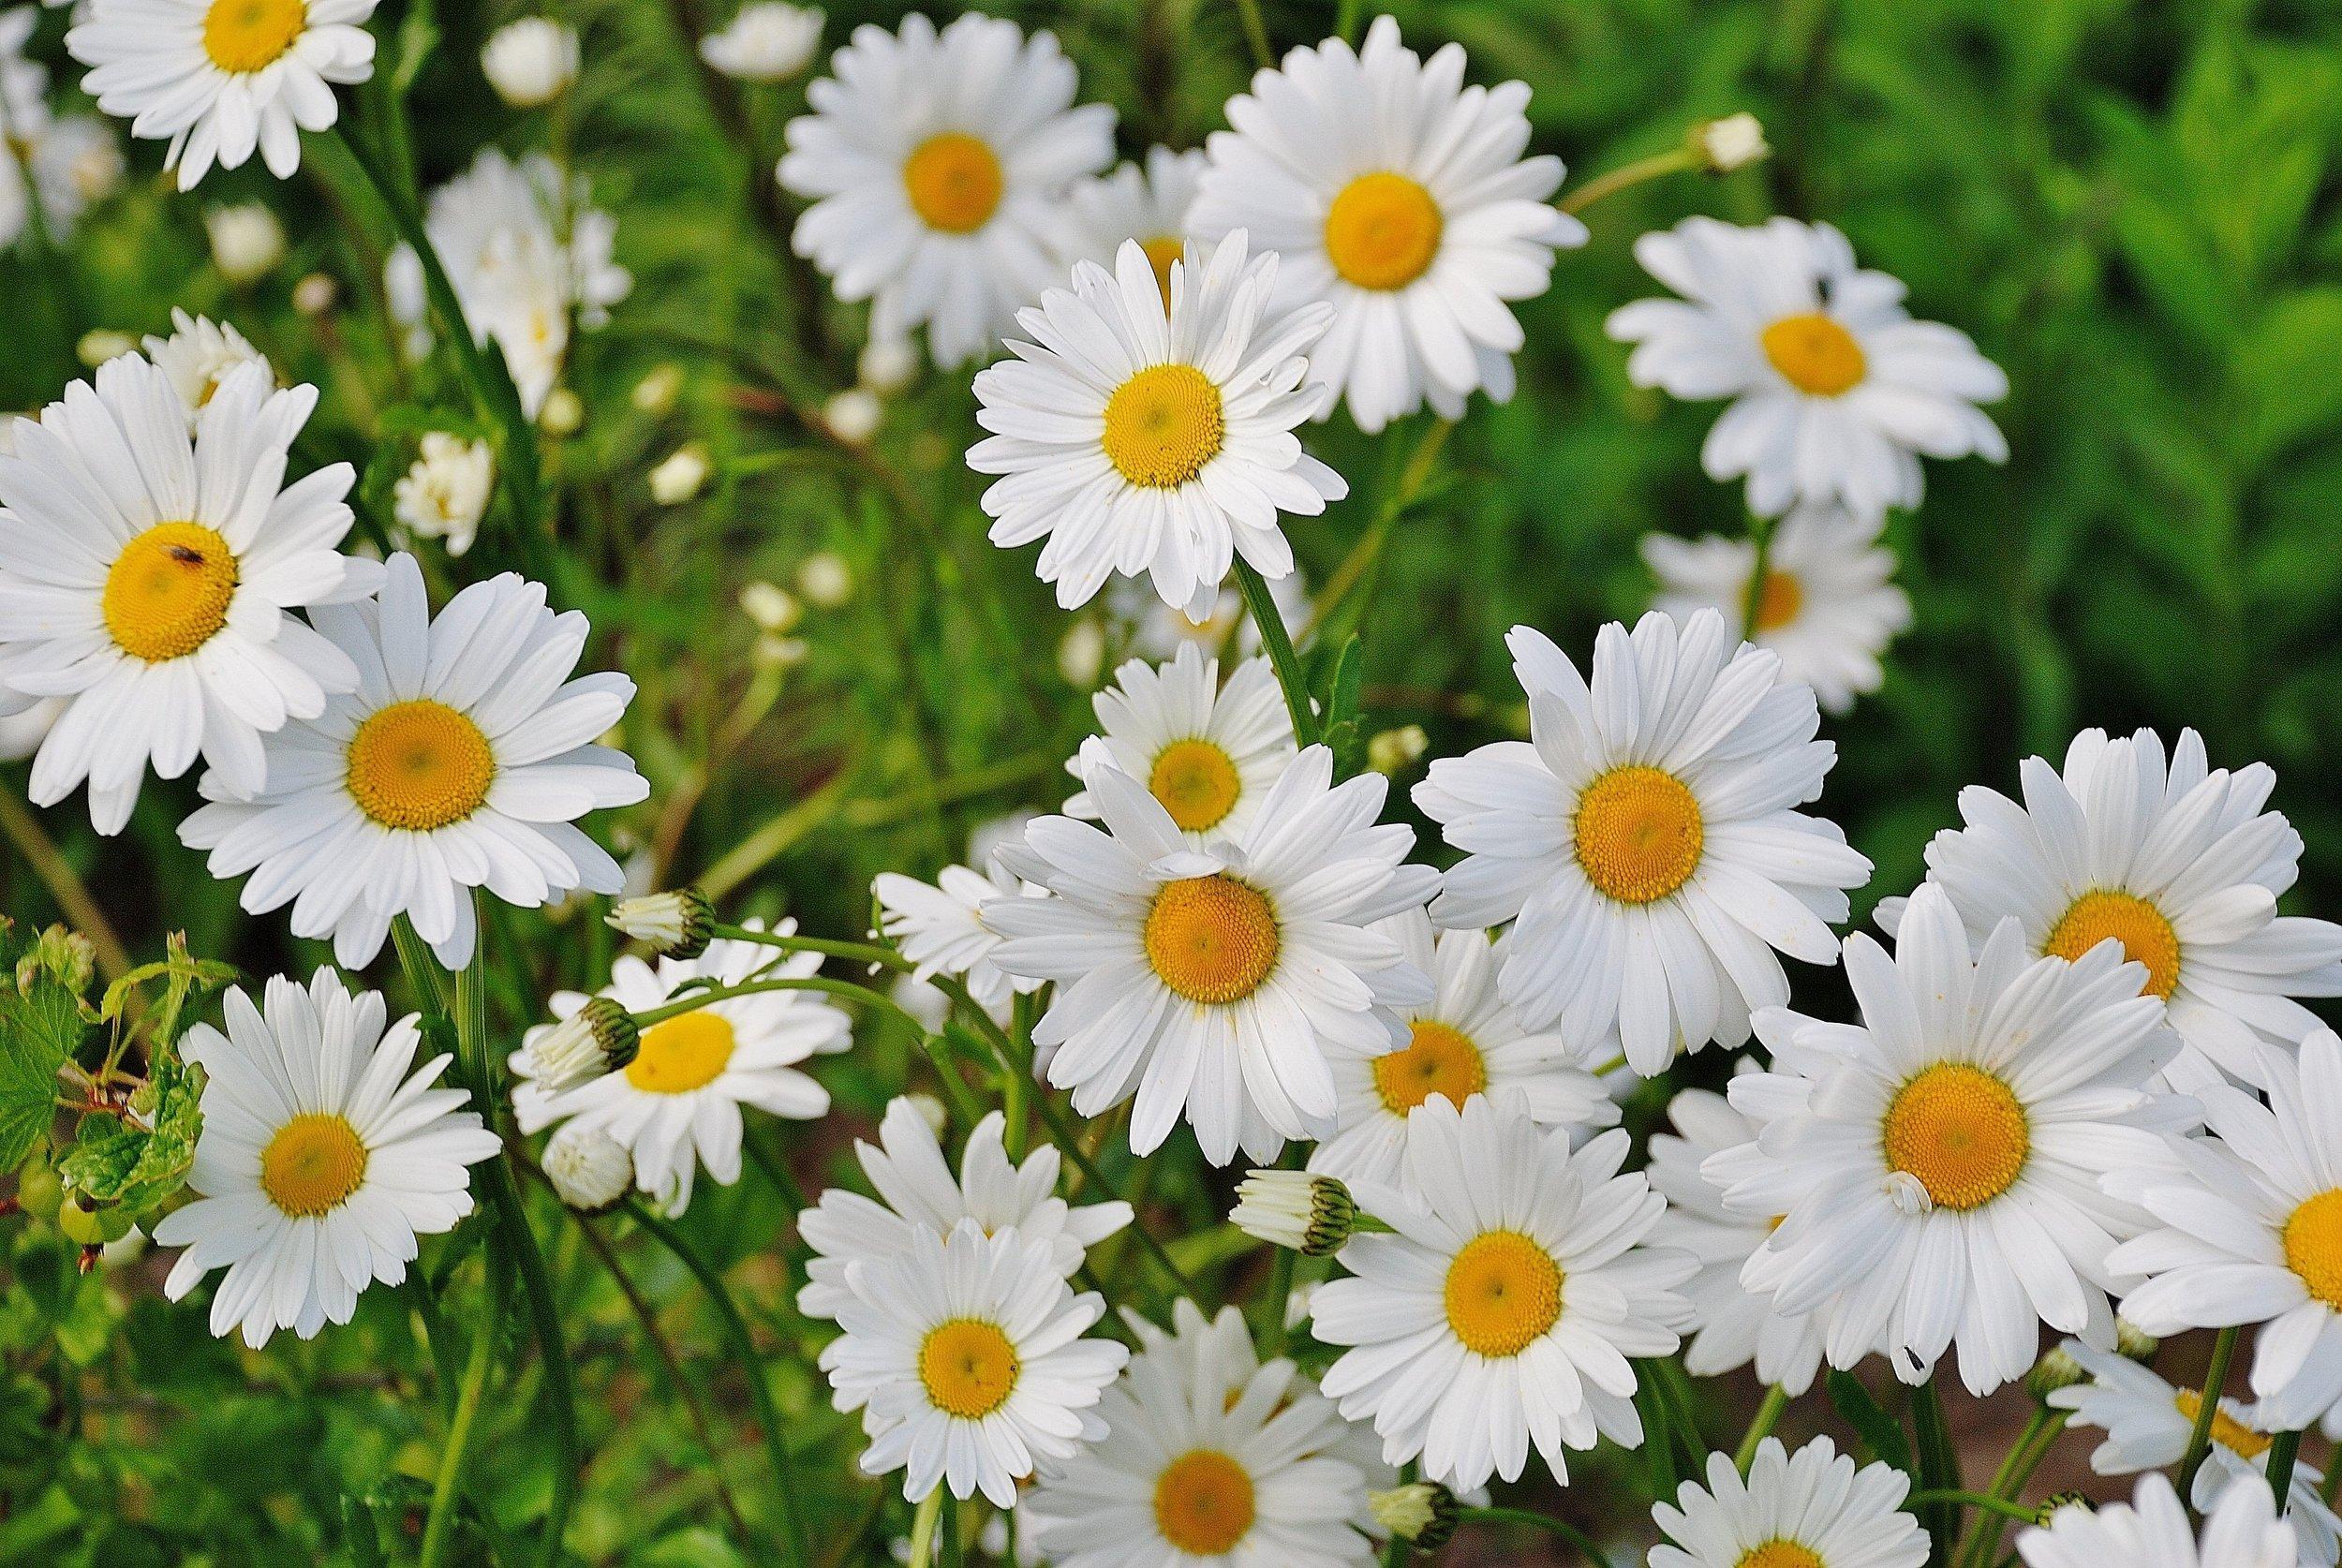 bloom-blossom-daisies-67857.jpg